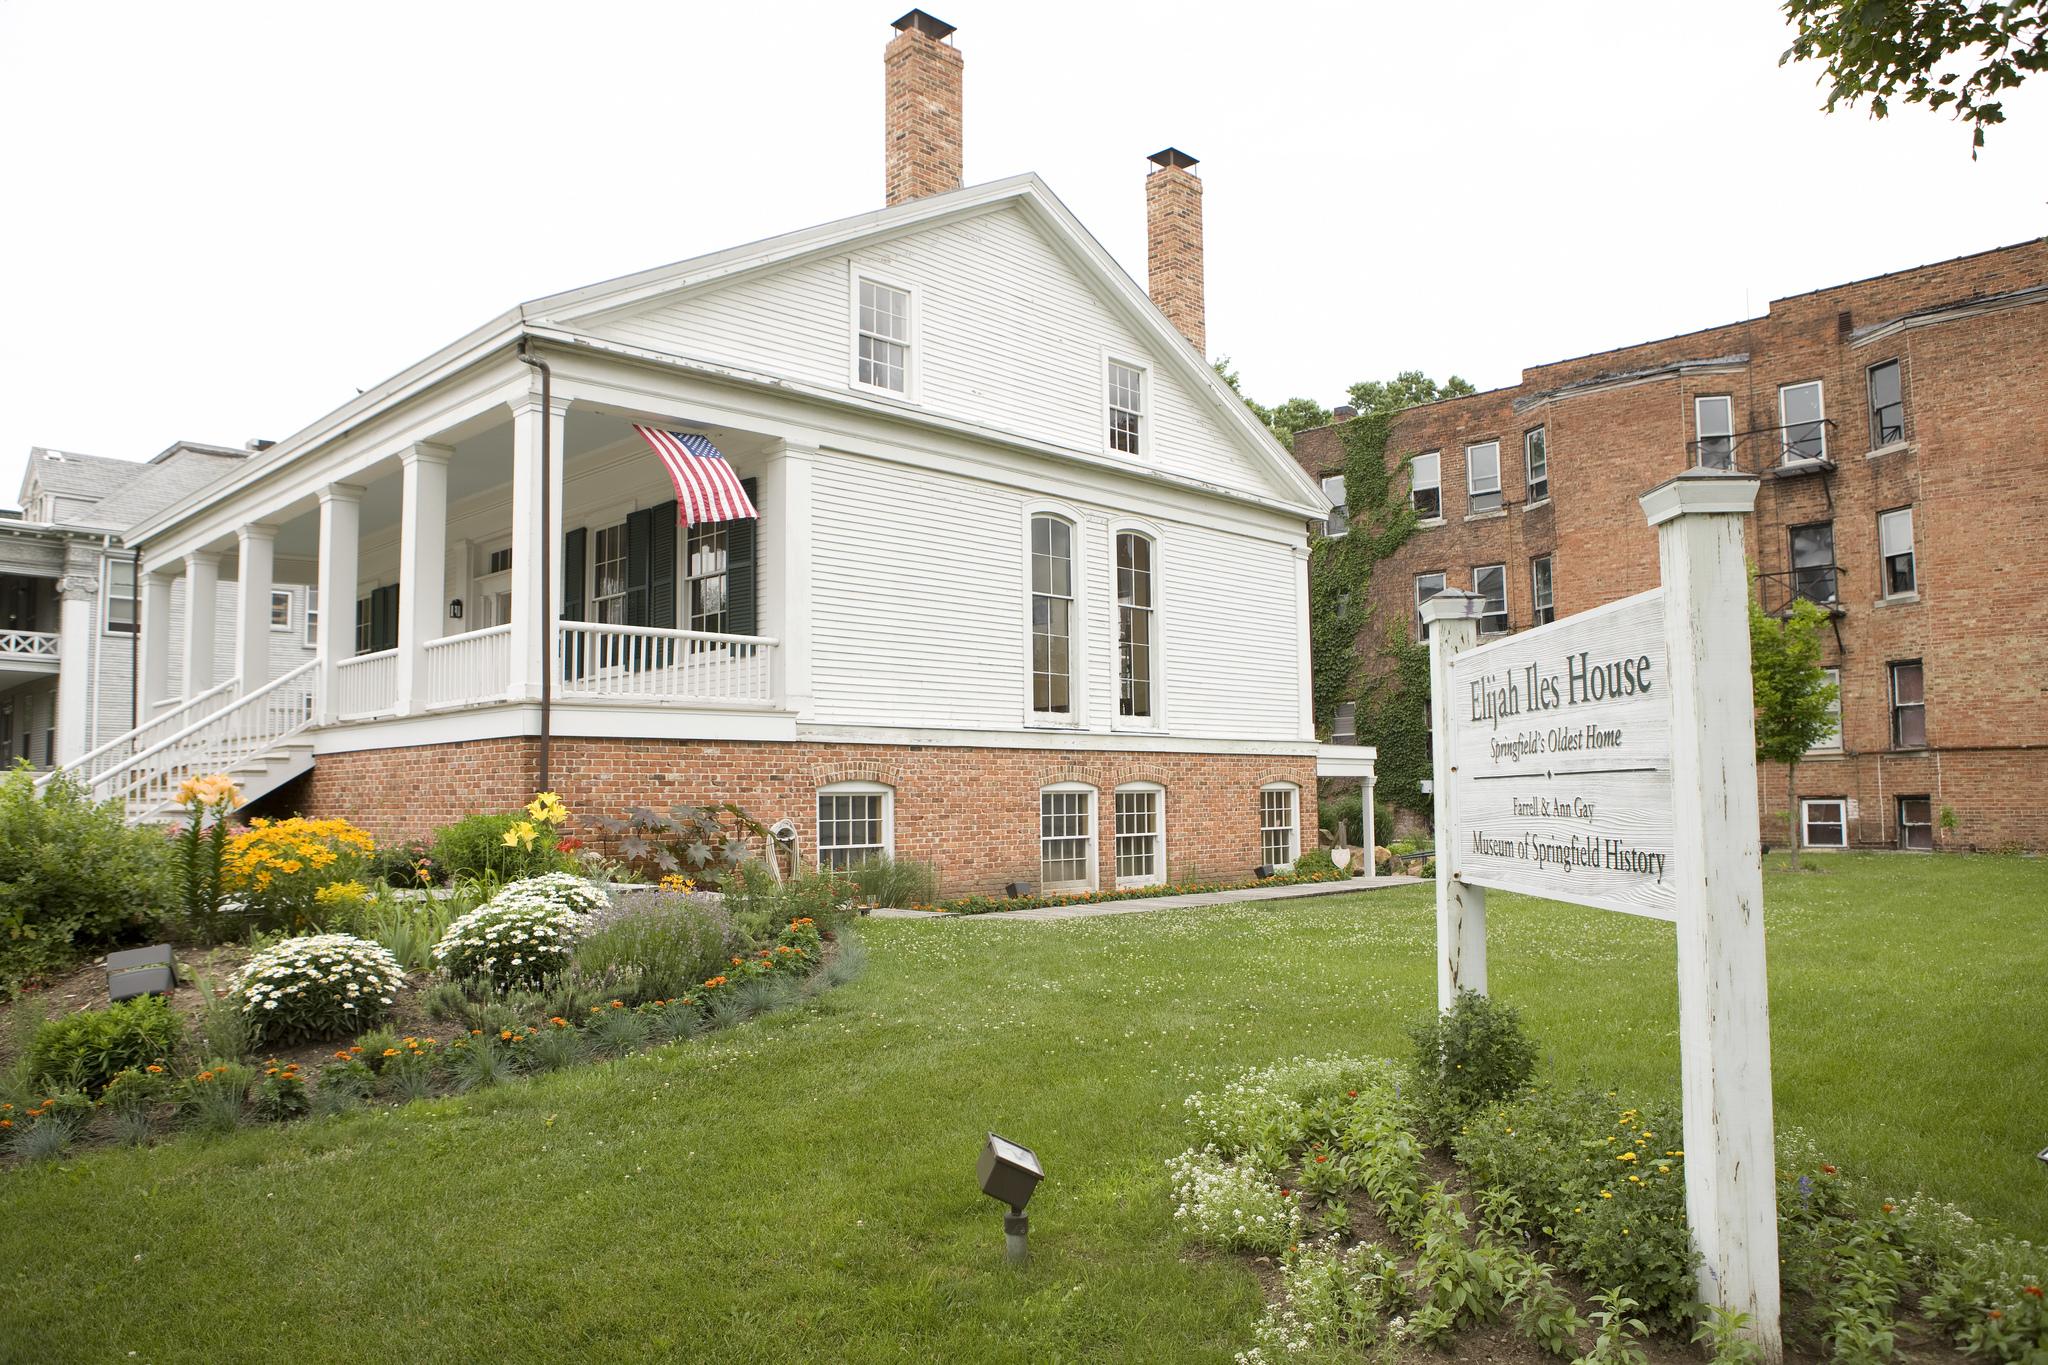 Elijah Iles House & the Museum of Springfield History